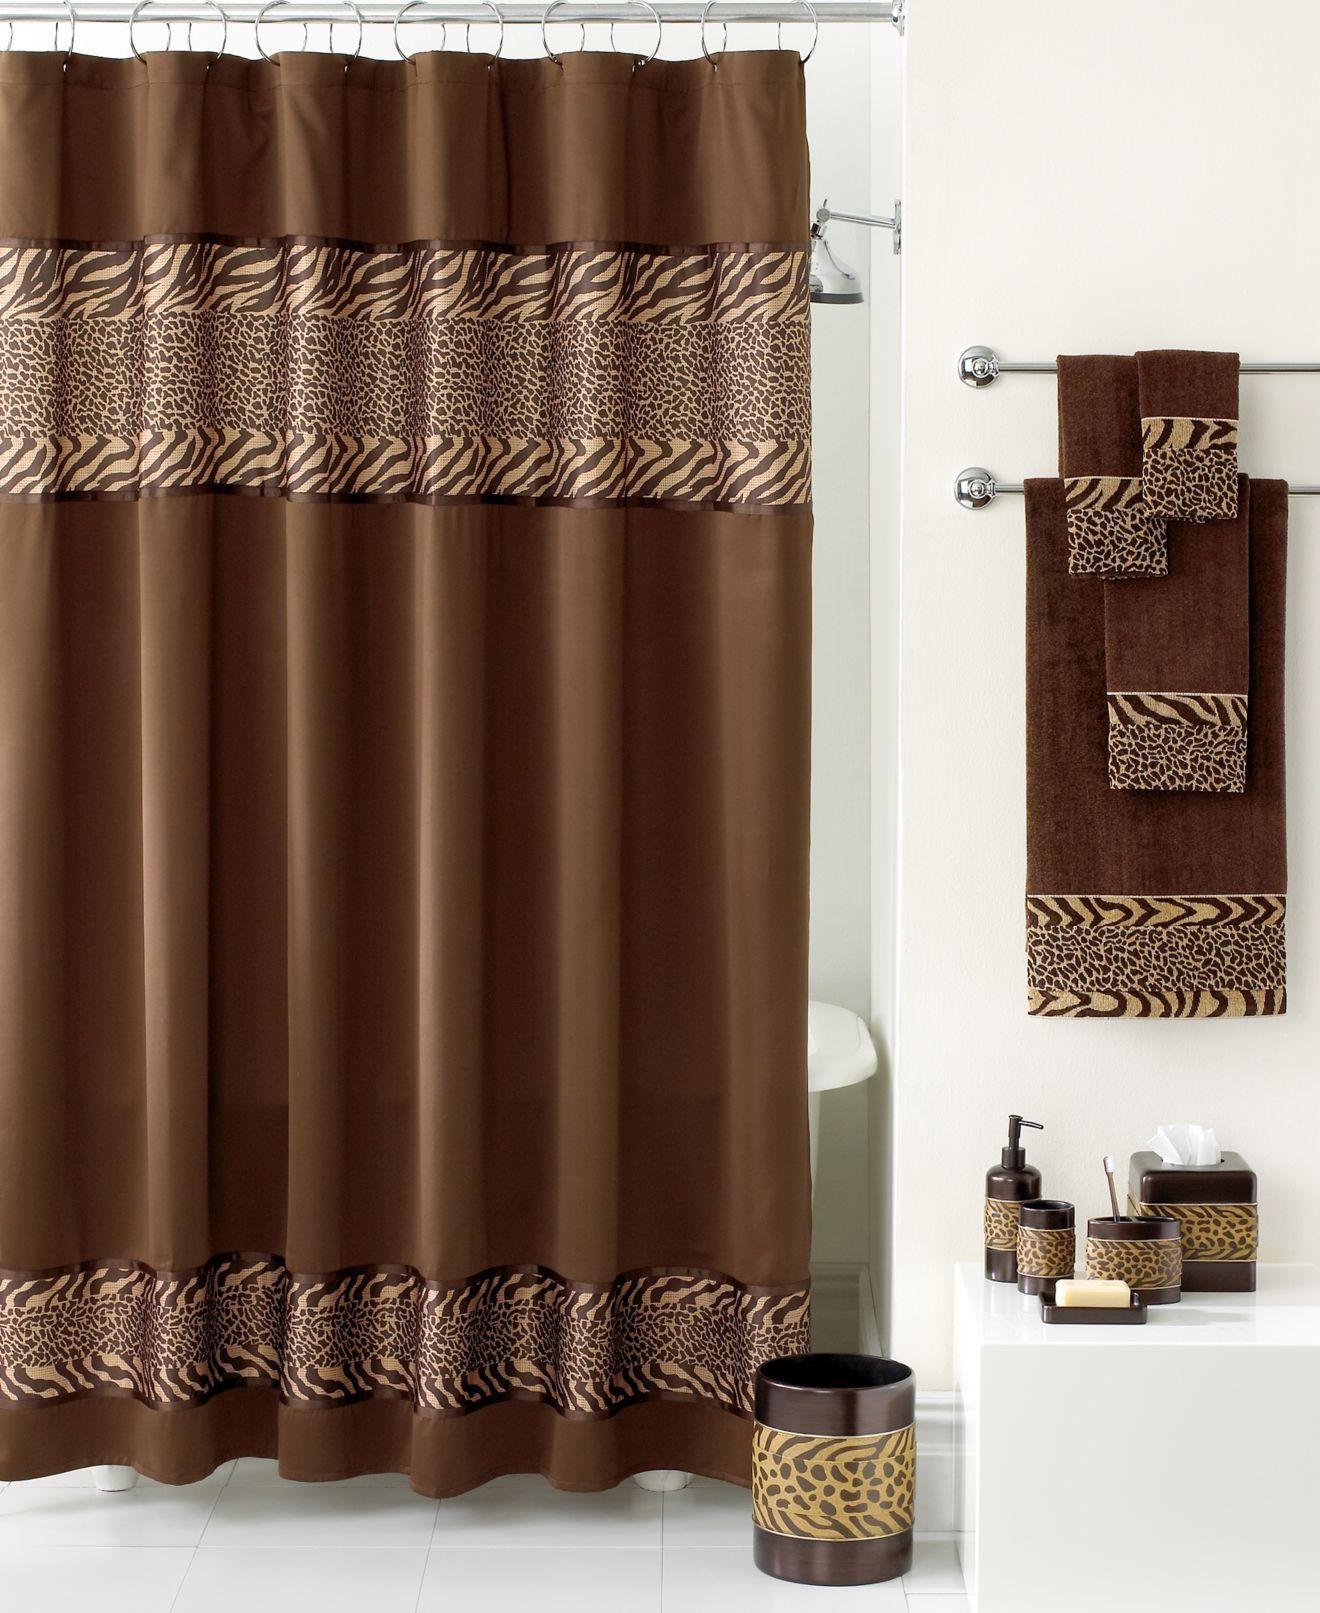 avanti bath, cheshire collection - bathroom accessories - bed